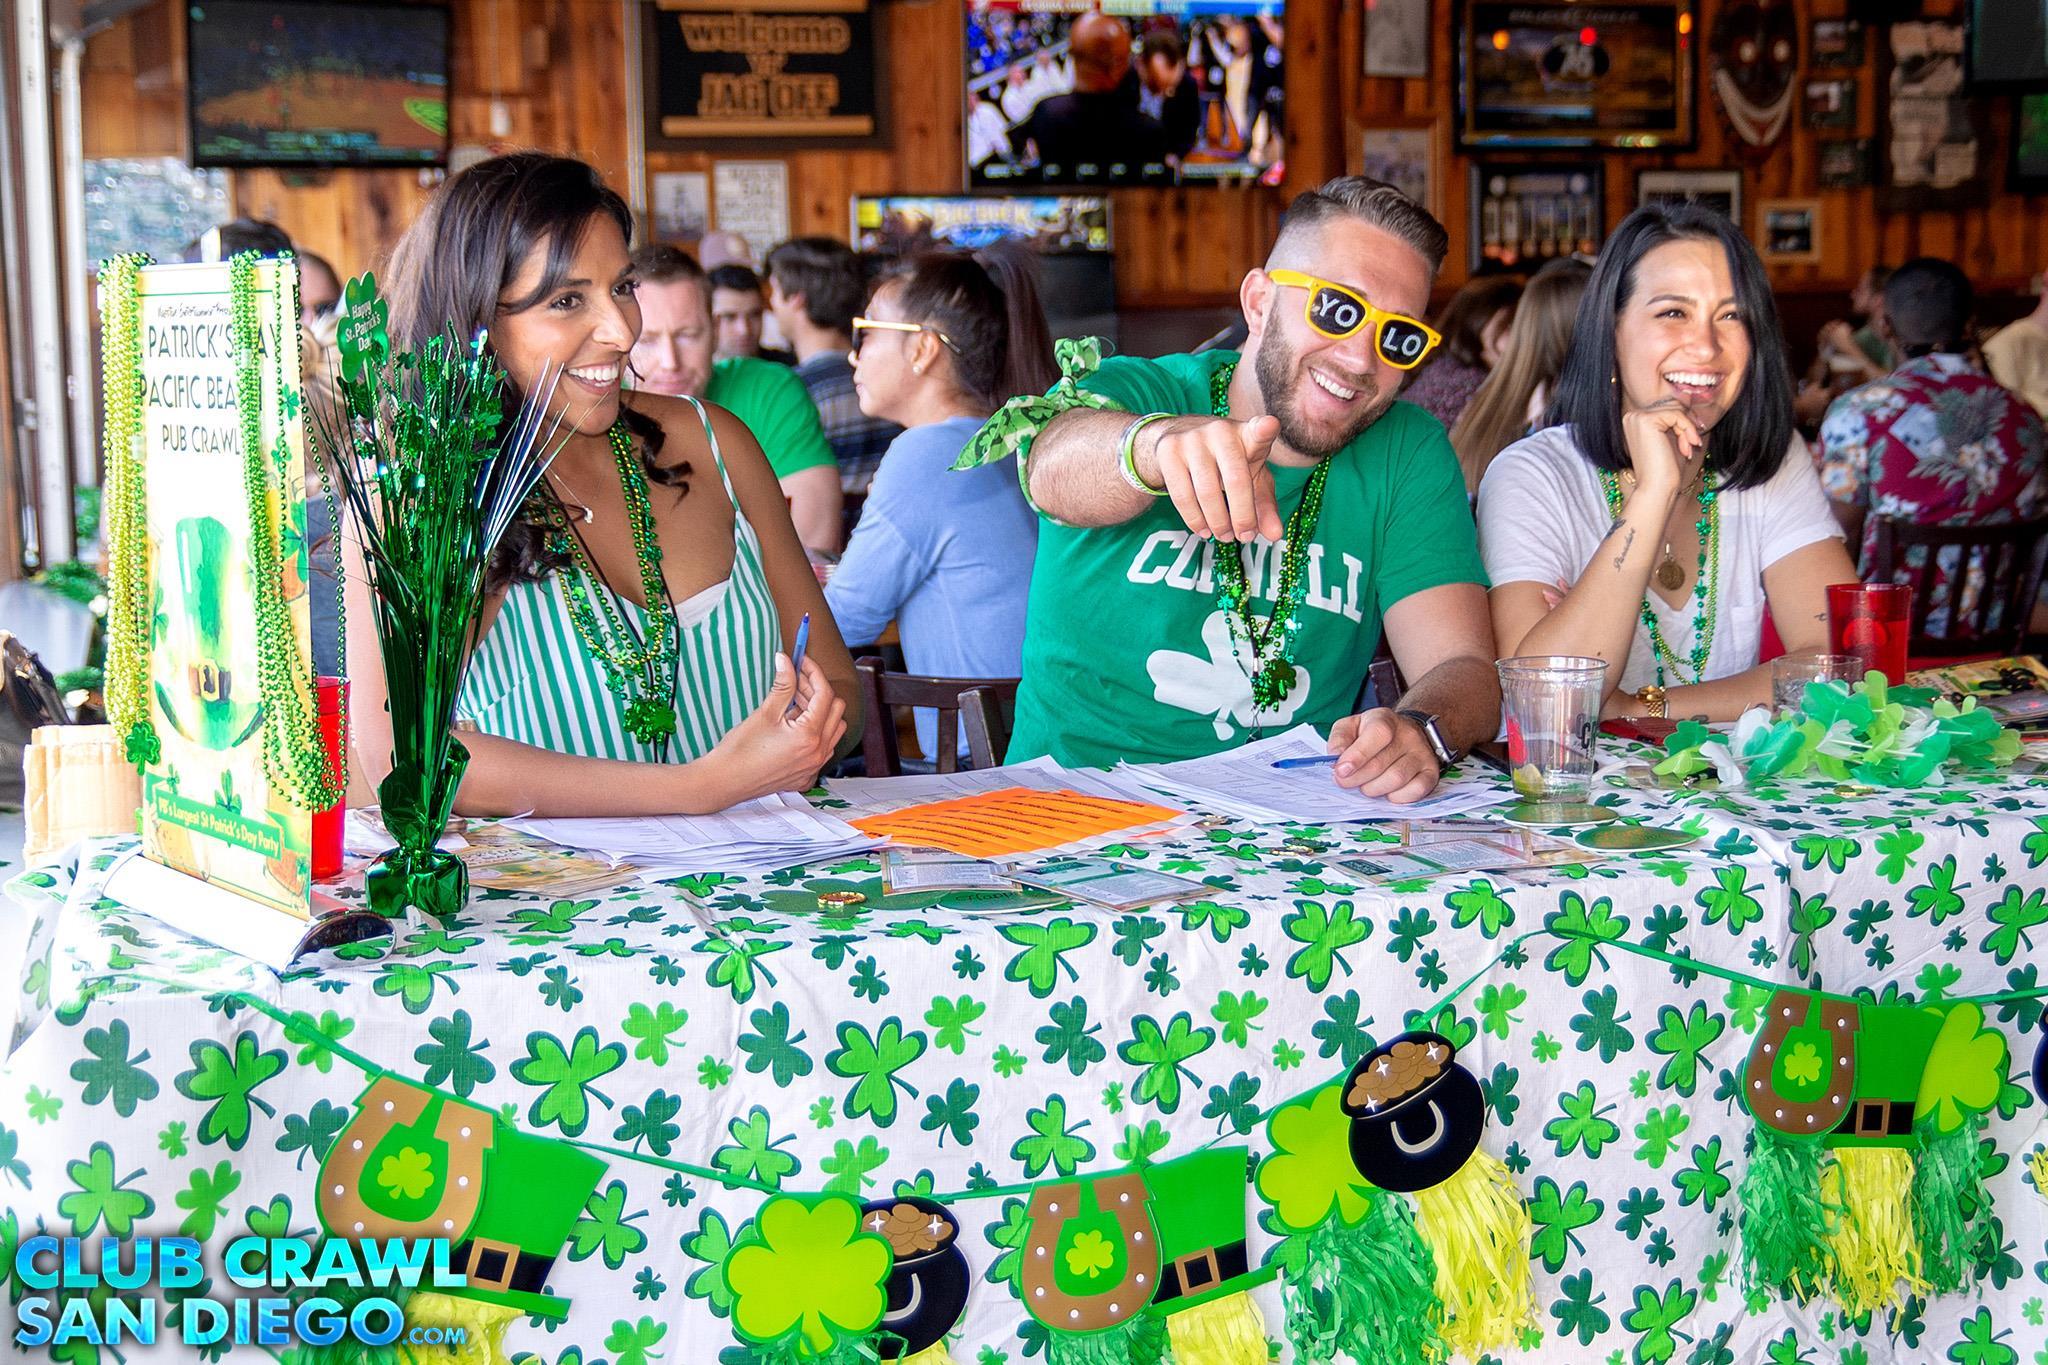 Daytime Pub Crawl Event on St. Patrick's Day